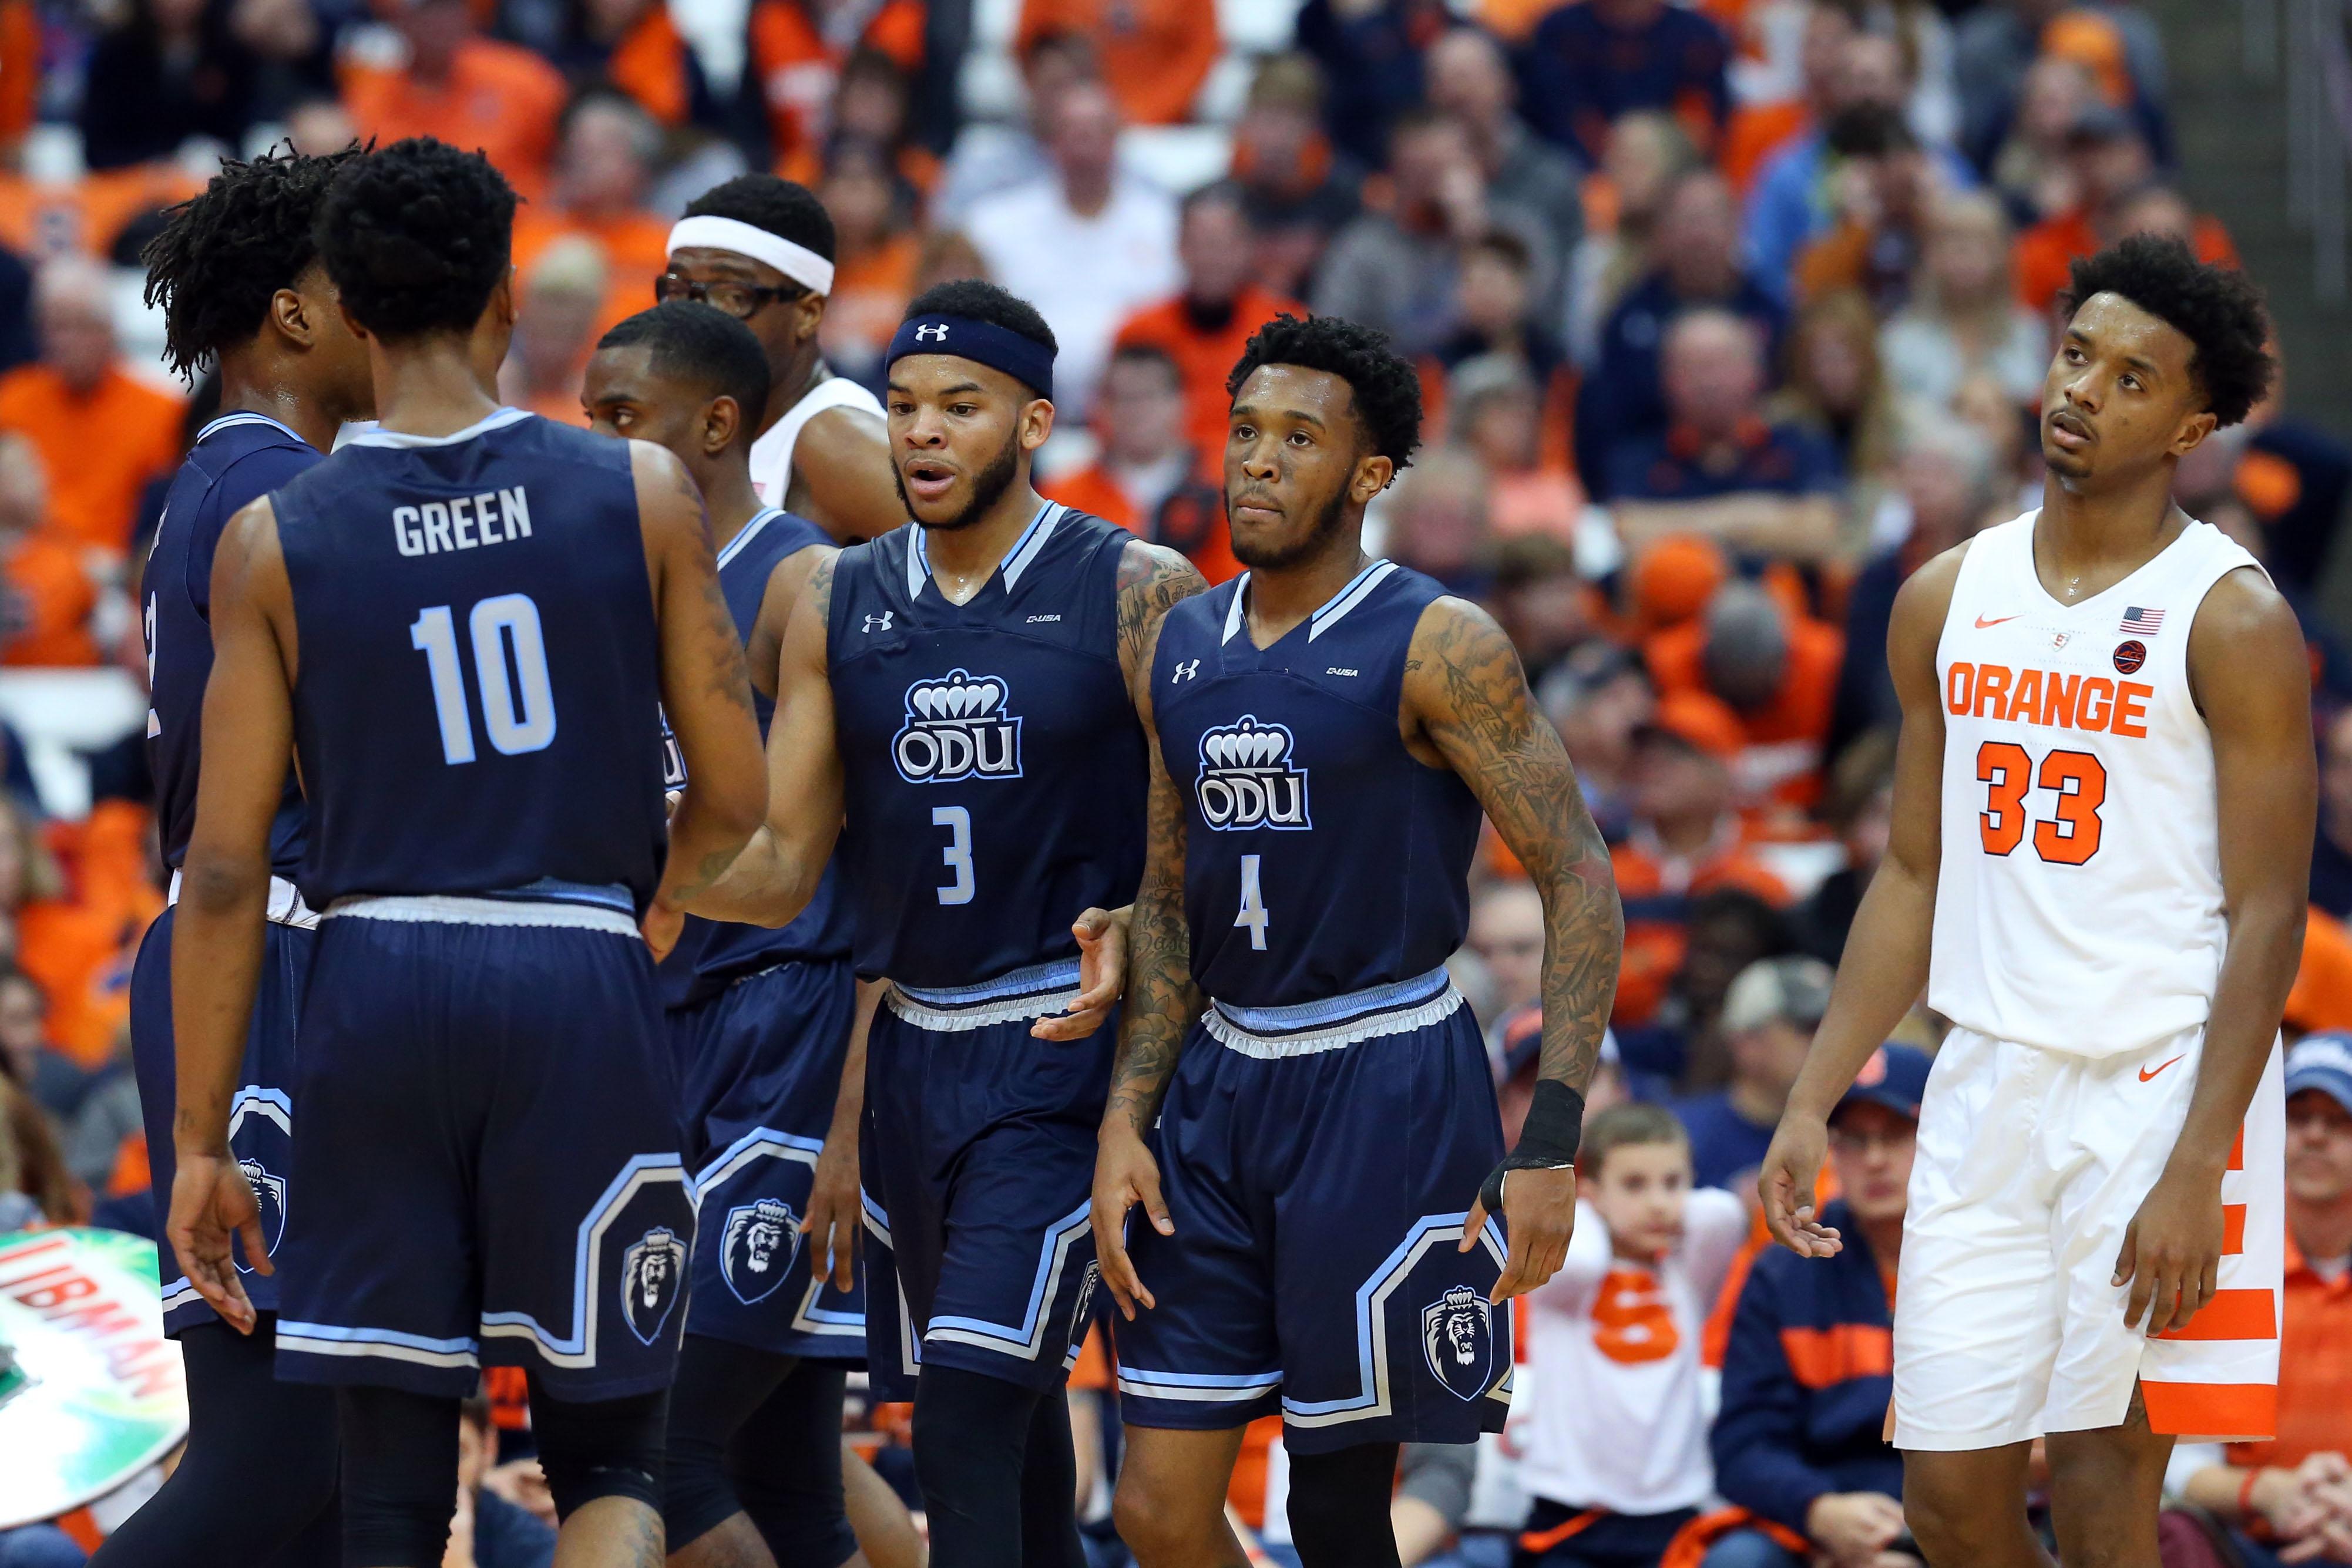 NCAA Basketball: Old Dominion at Syracuse